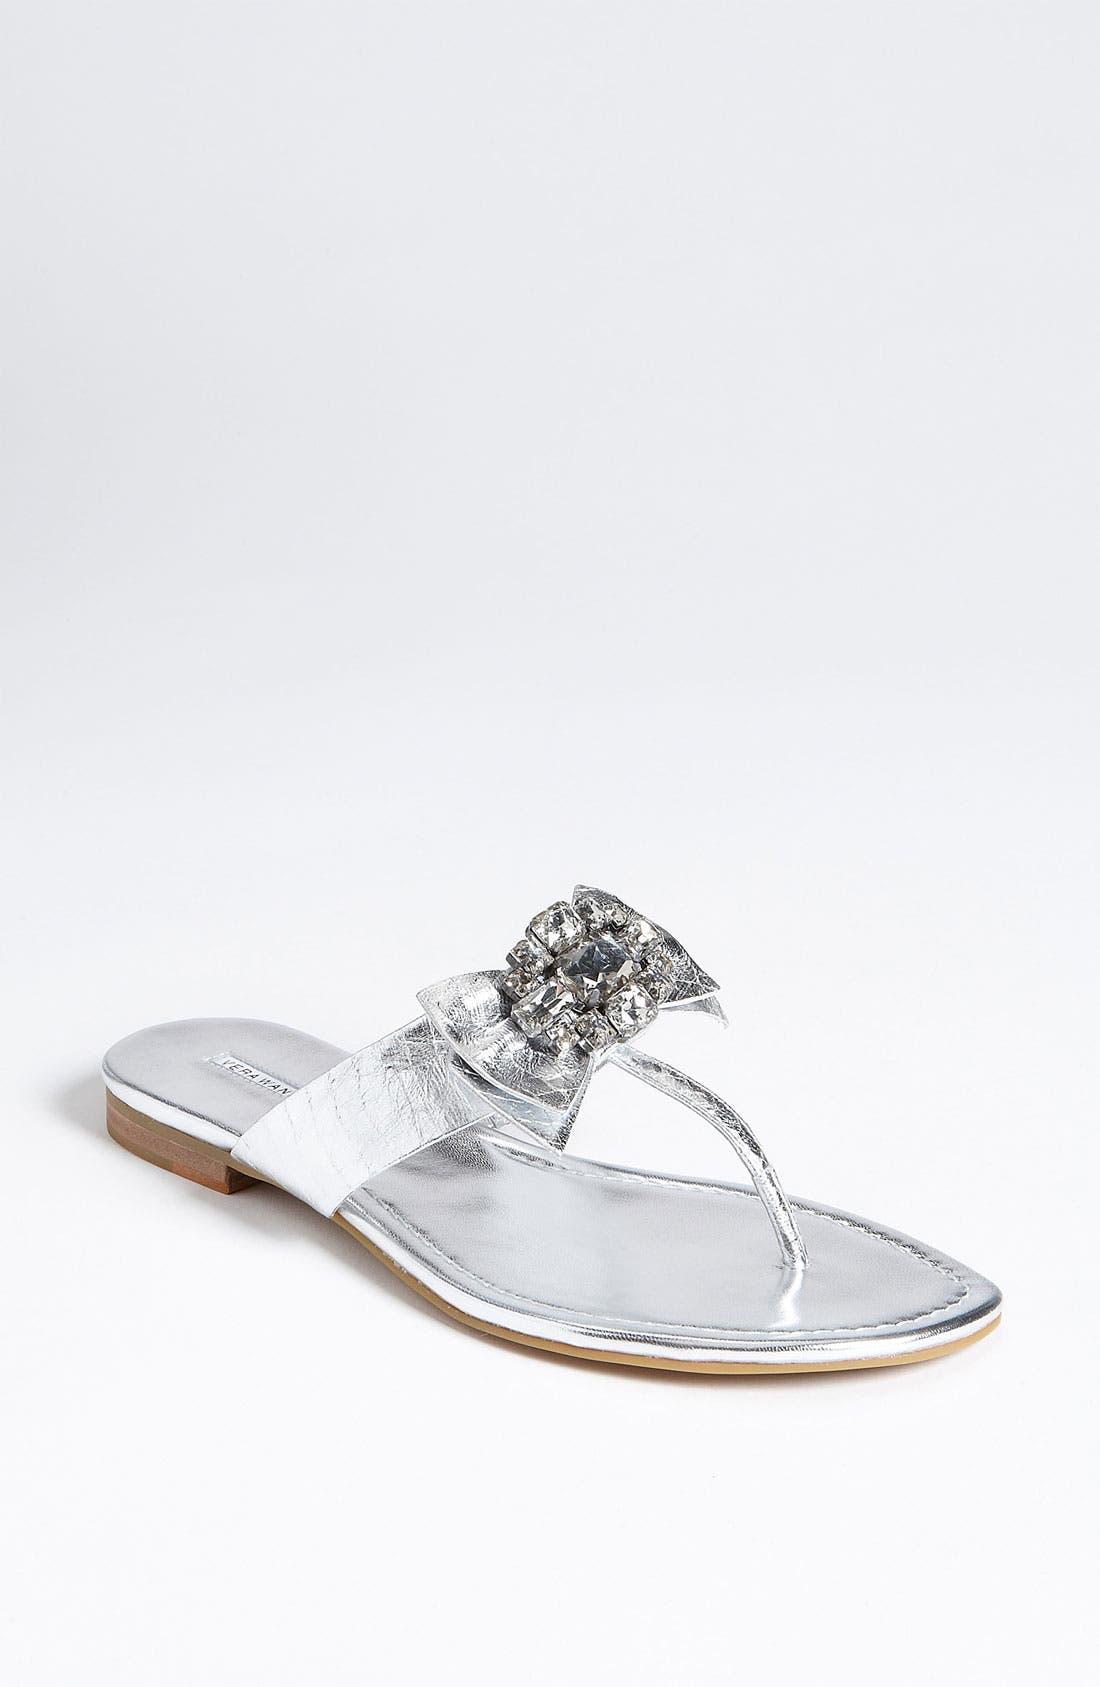 Main Image - Vera Wang Footwear 'Willa' Sandal